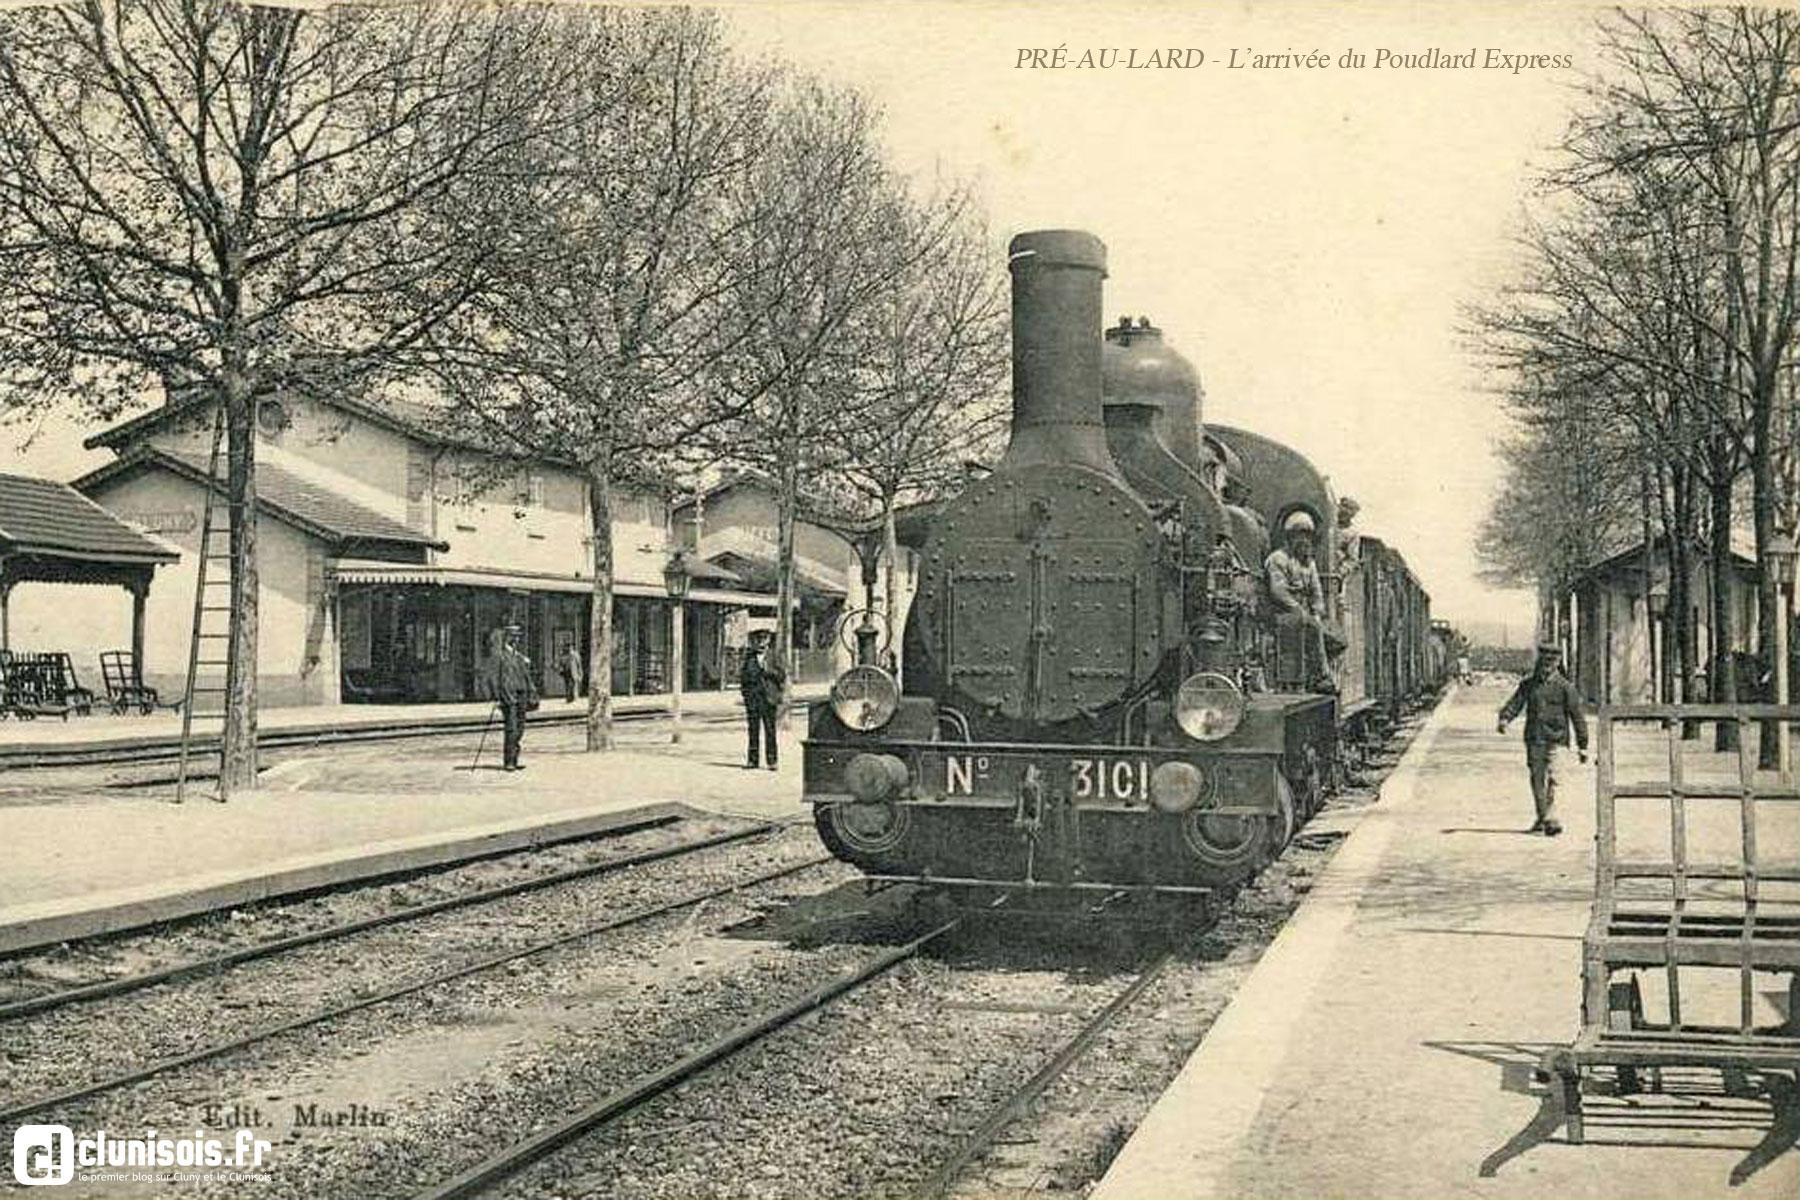 17-poudlard-existe-gare-poudlard-express